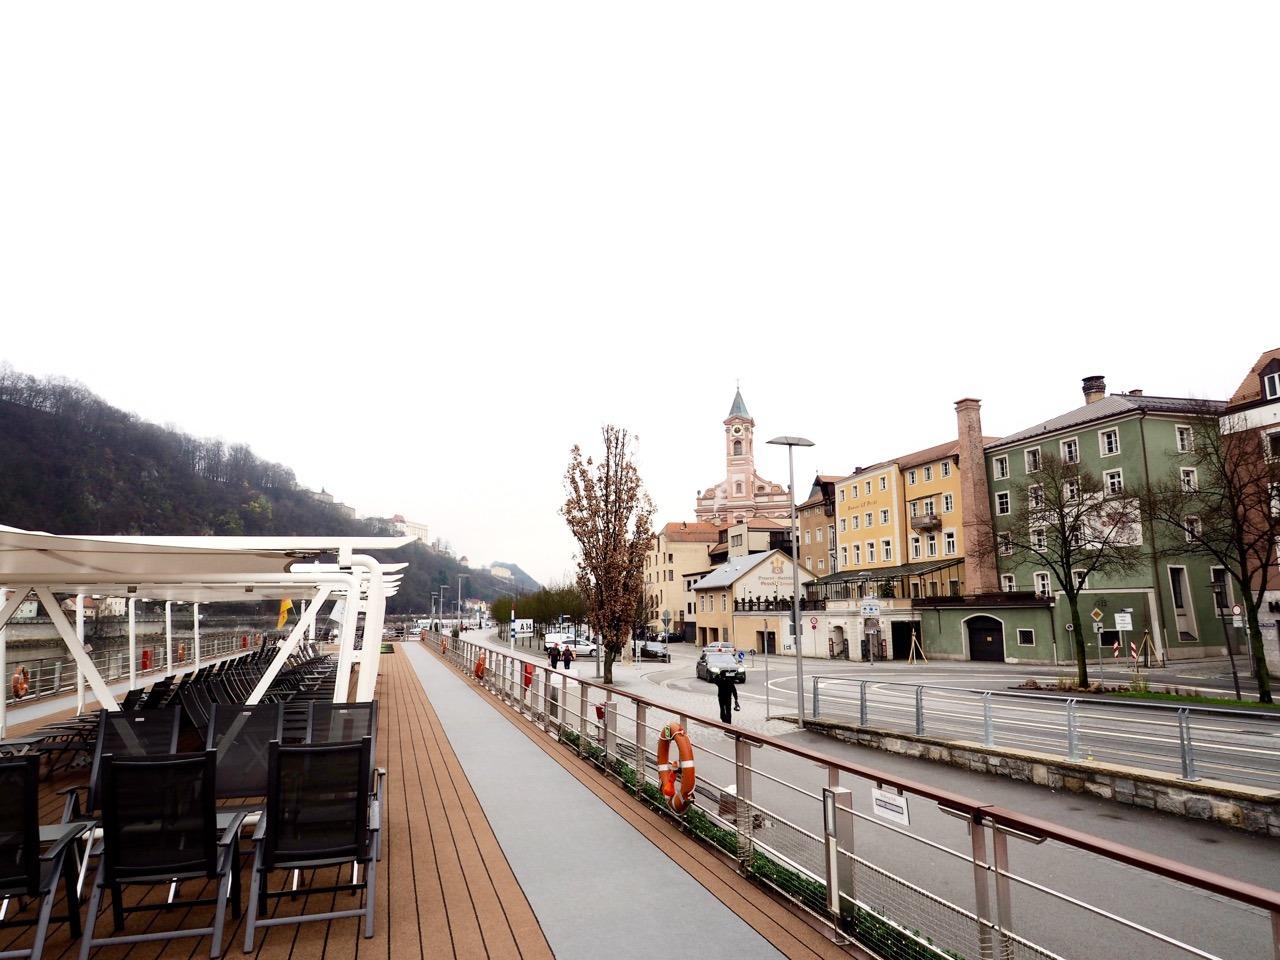 Viking River Cruises Danube Waltz